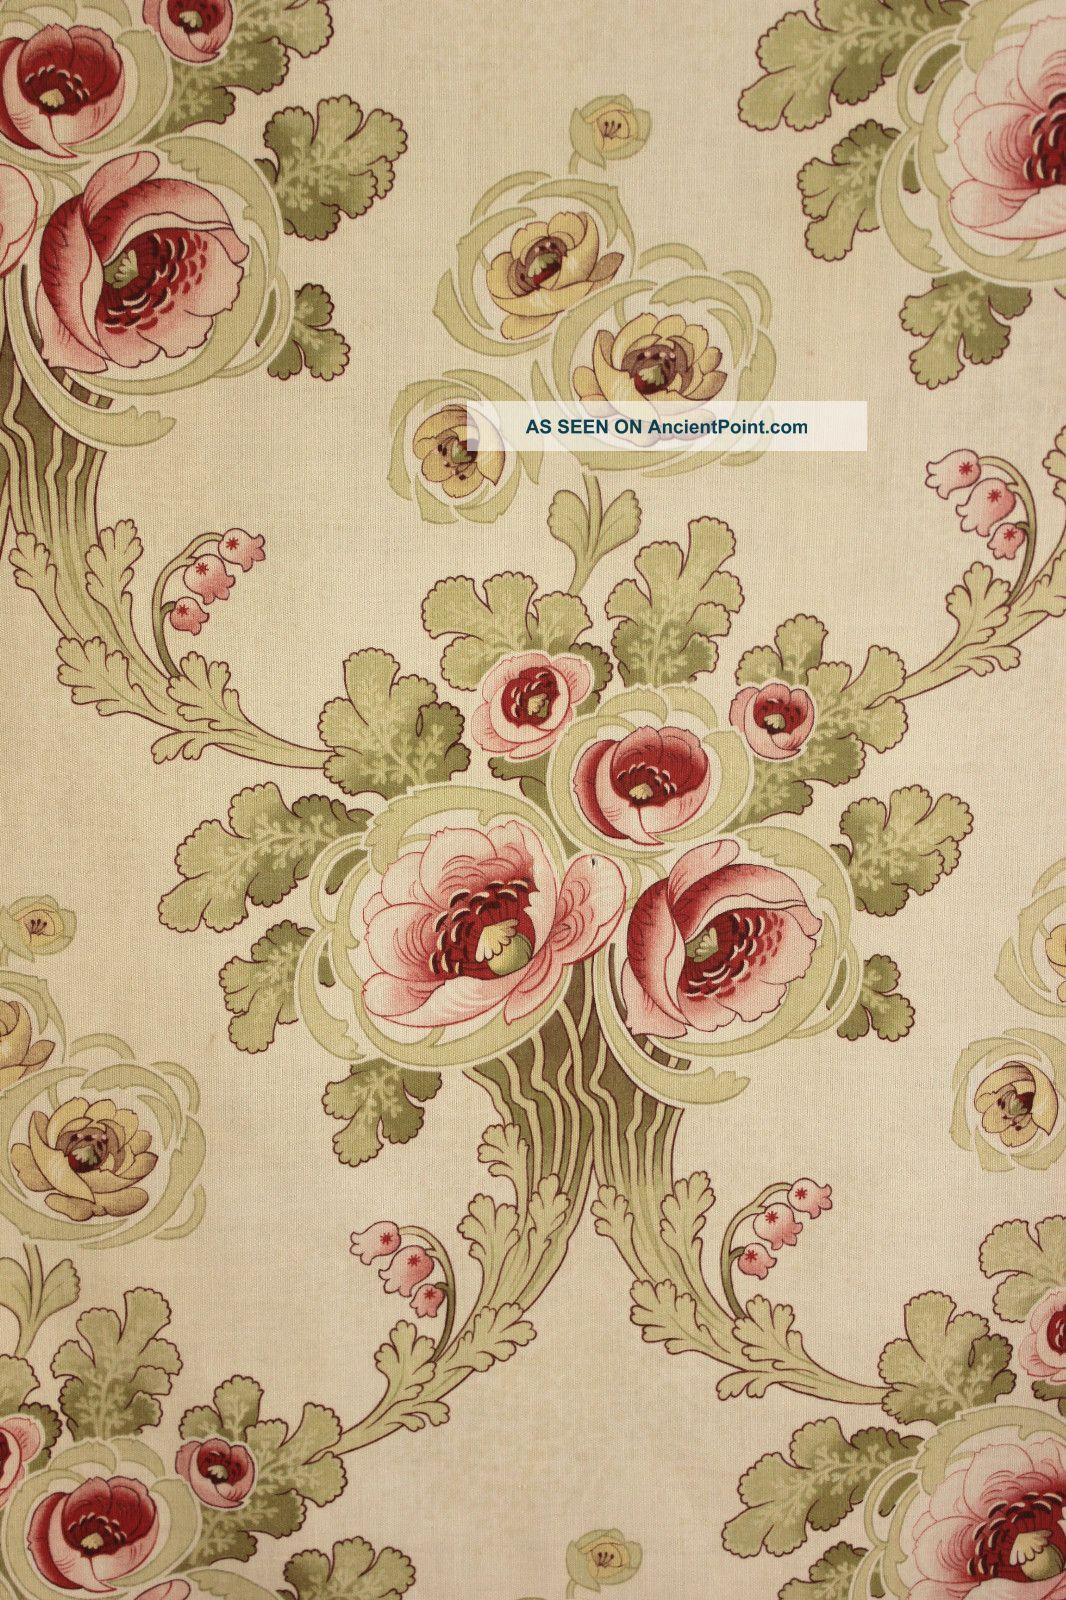 Kinds Of Vintage Floral Curtains - Antique french art nouveau printed cotton fabric material pinks greens c1905 art nouveau photo